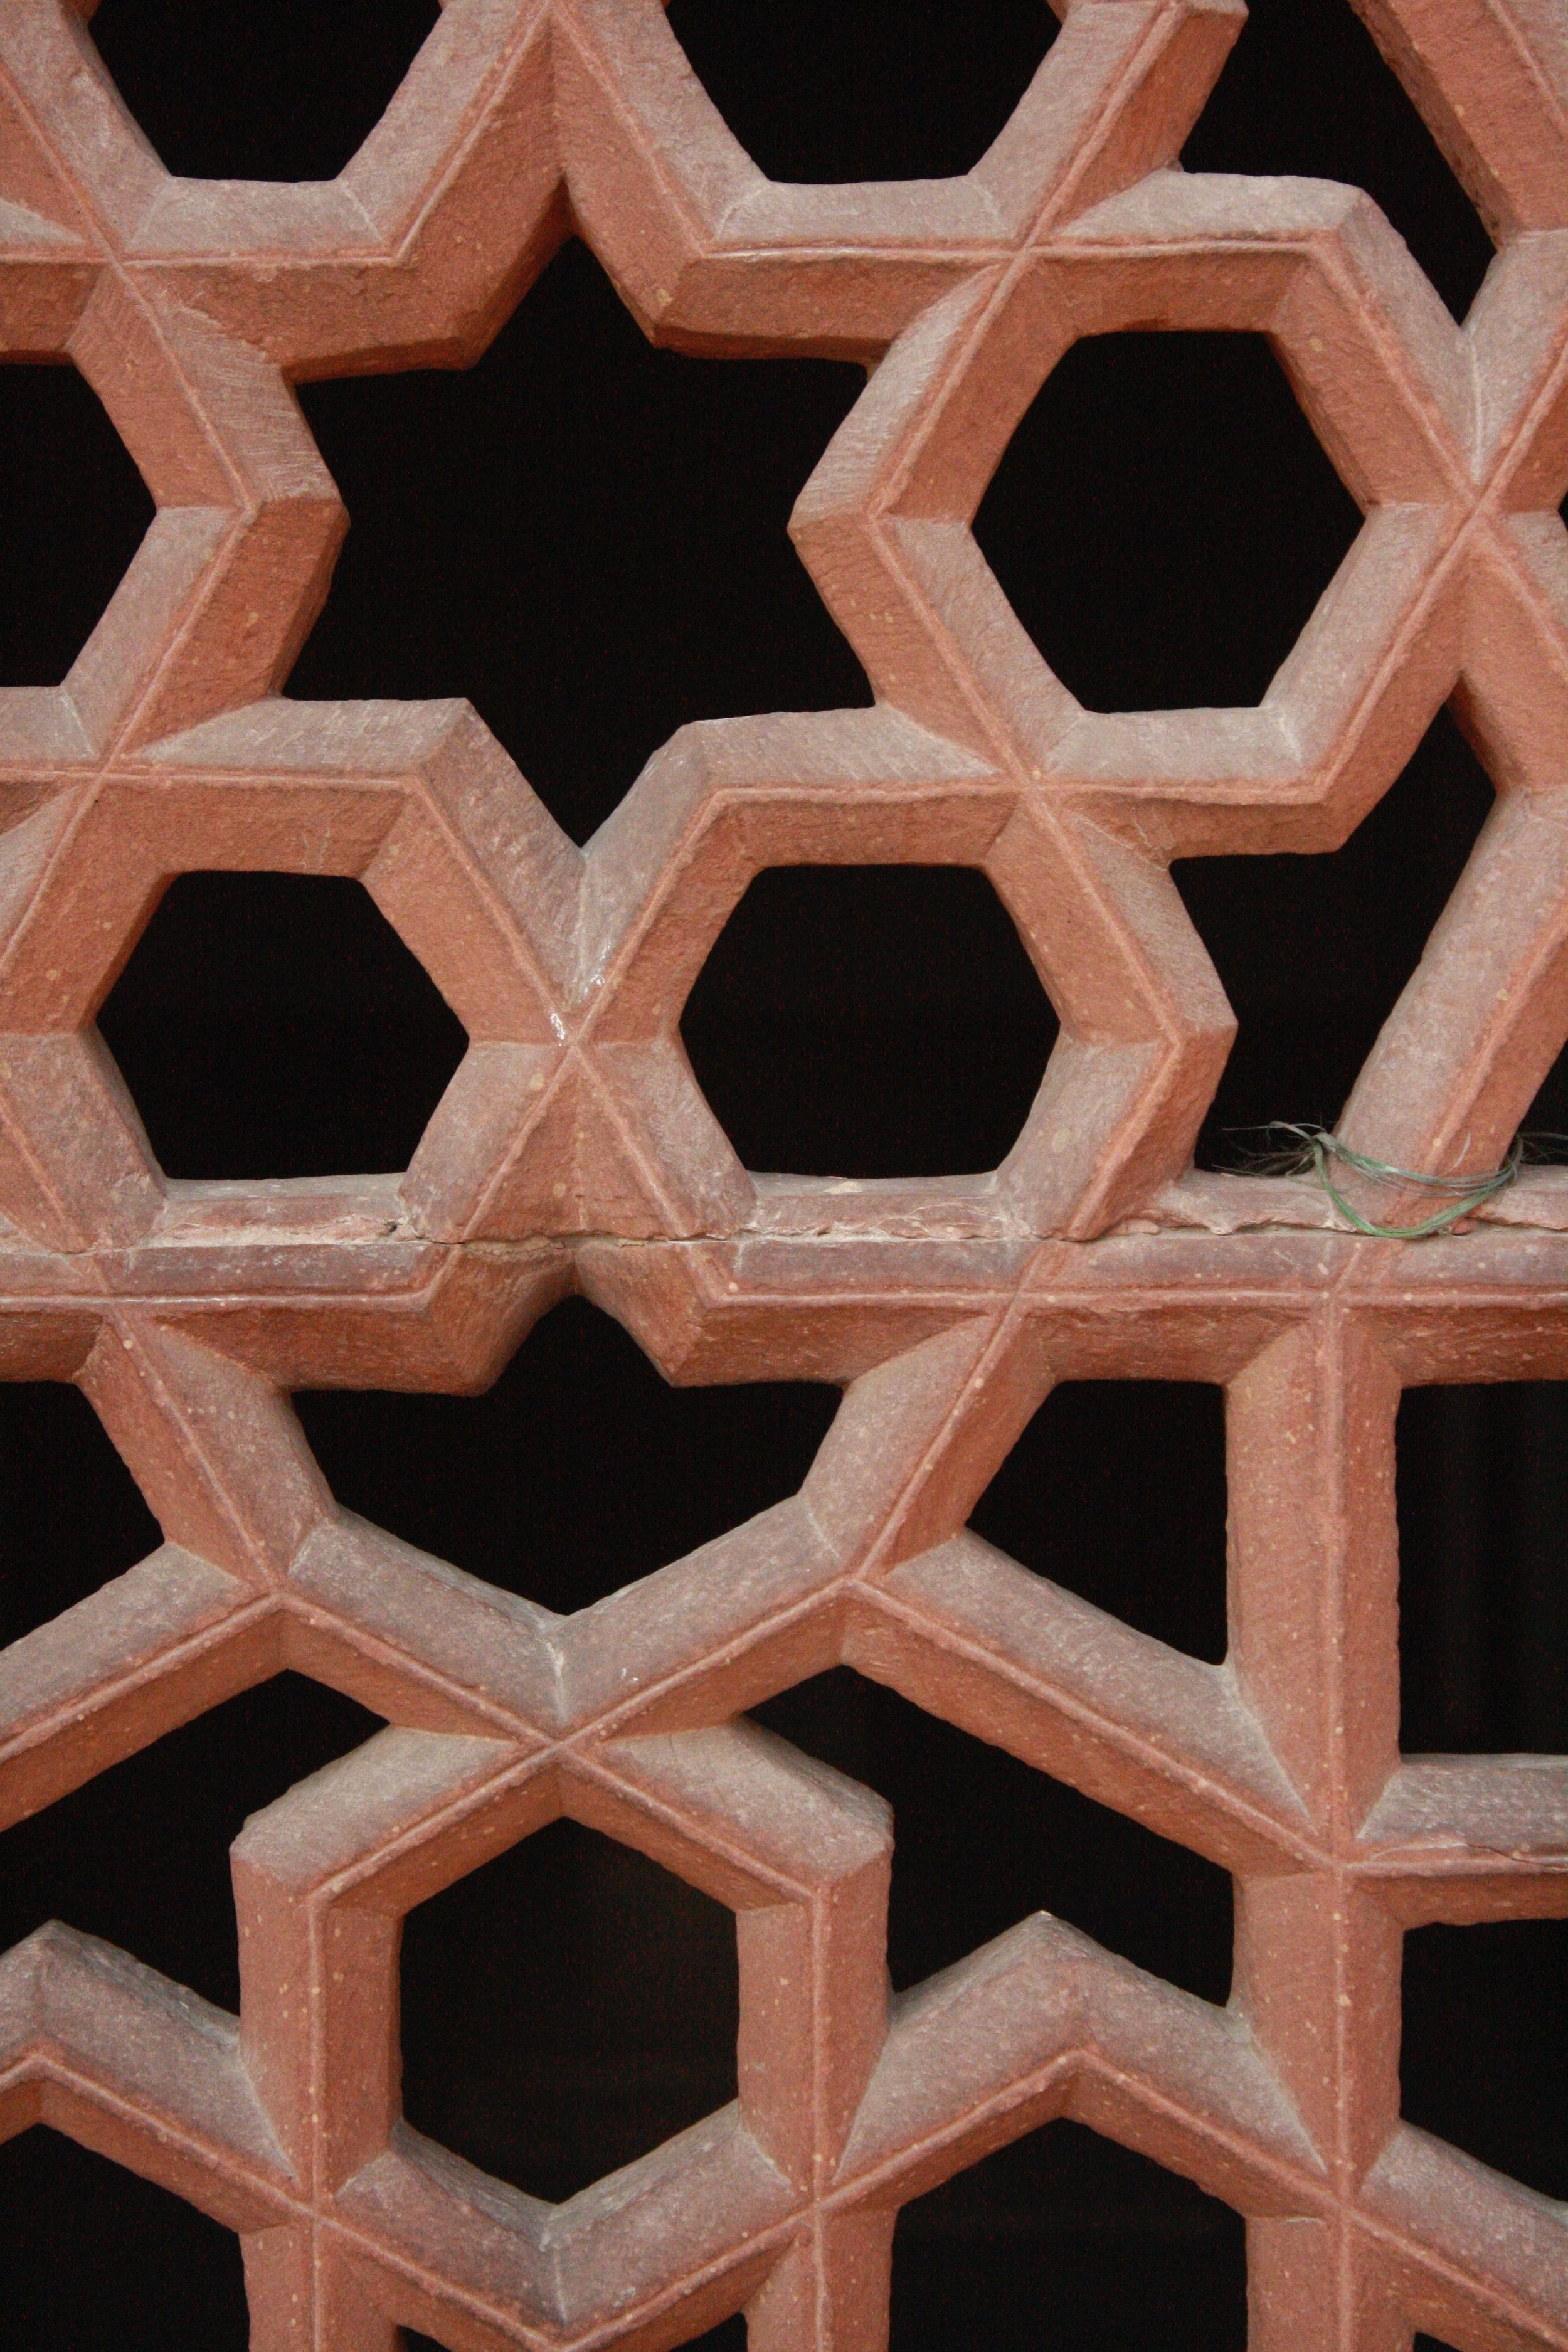 Spider web lattice work at Humayun's Tomb